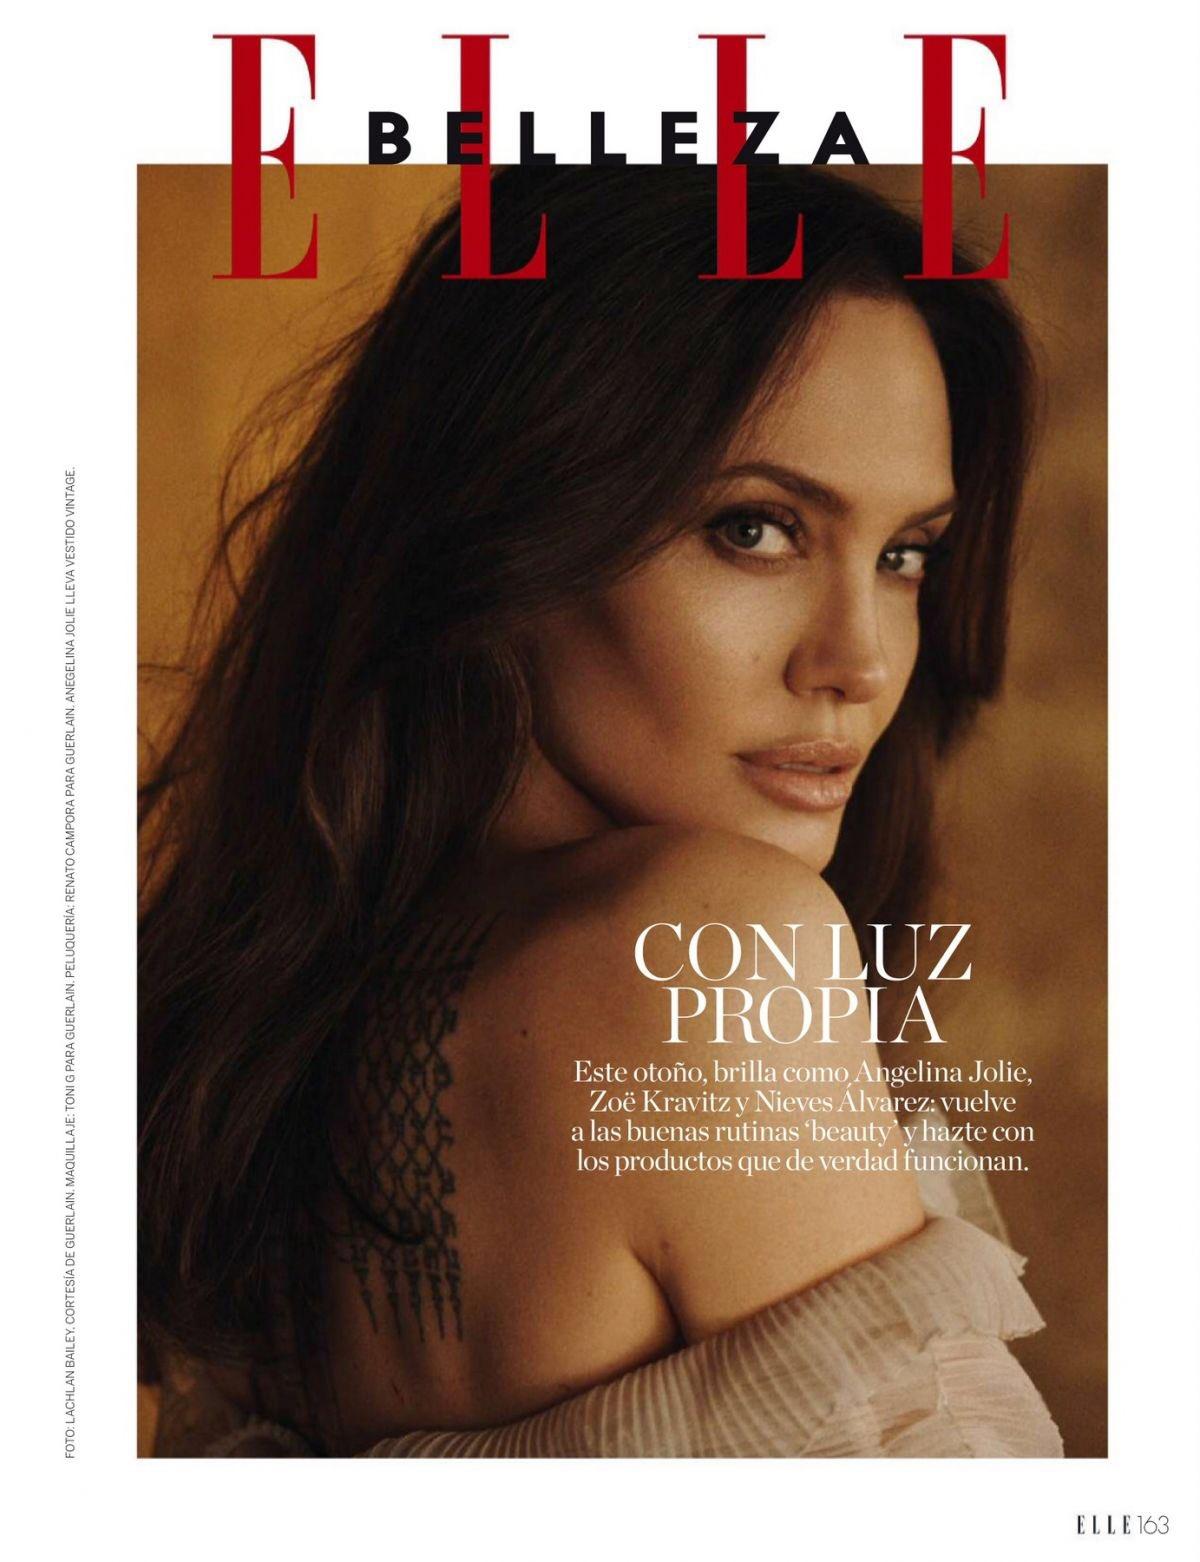 "Angelina Jolie on Twitter: ""🆕 Angelina Jolie in Elle Magazine, Spain October 2021 👏🏻😍❤️ https://t.co/rFPU6B0JLG"" / Twitter"